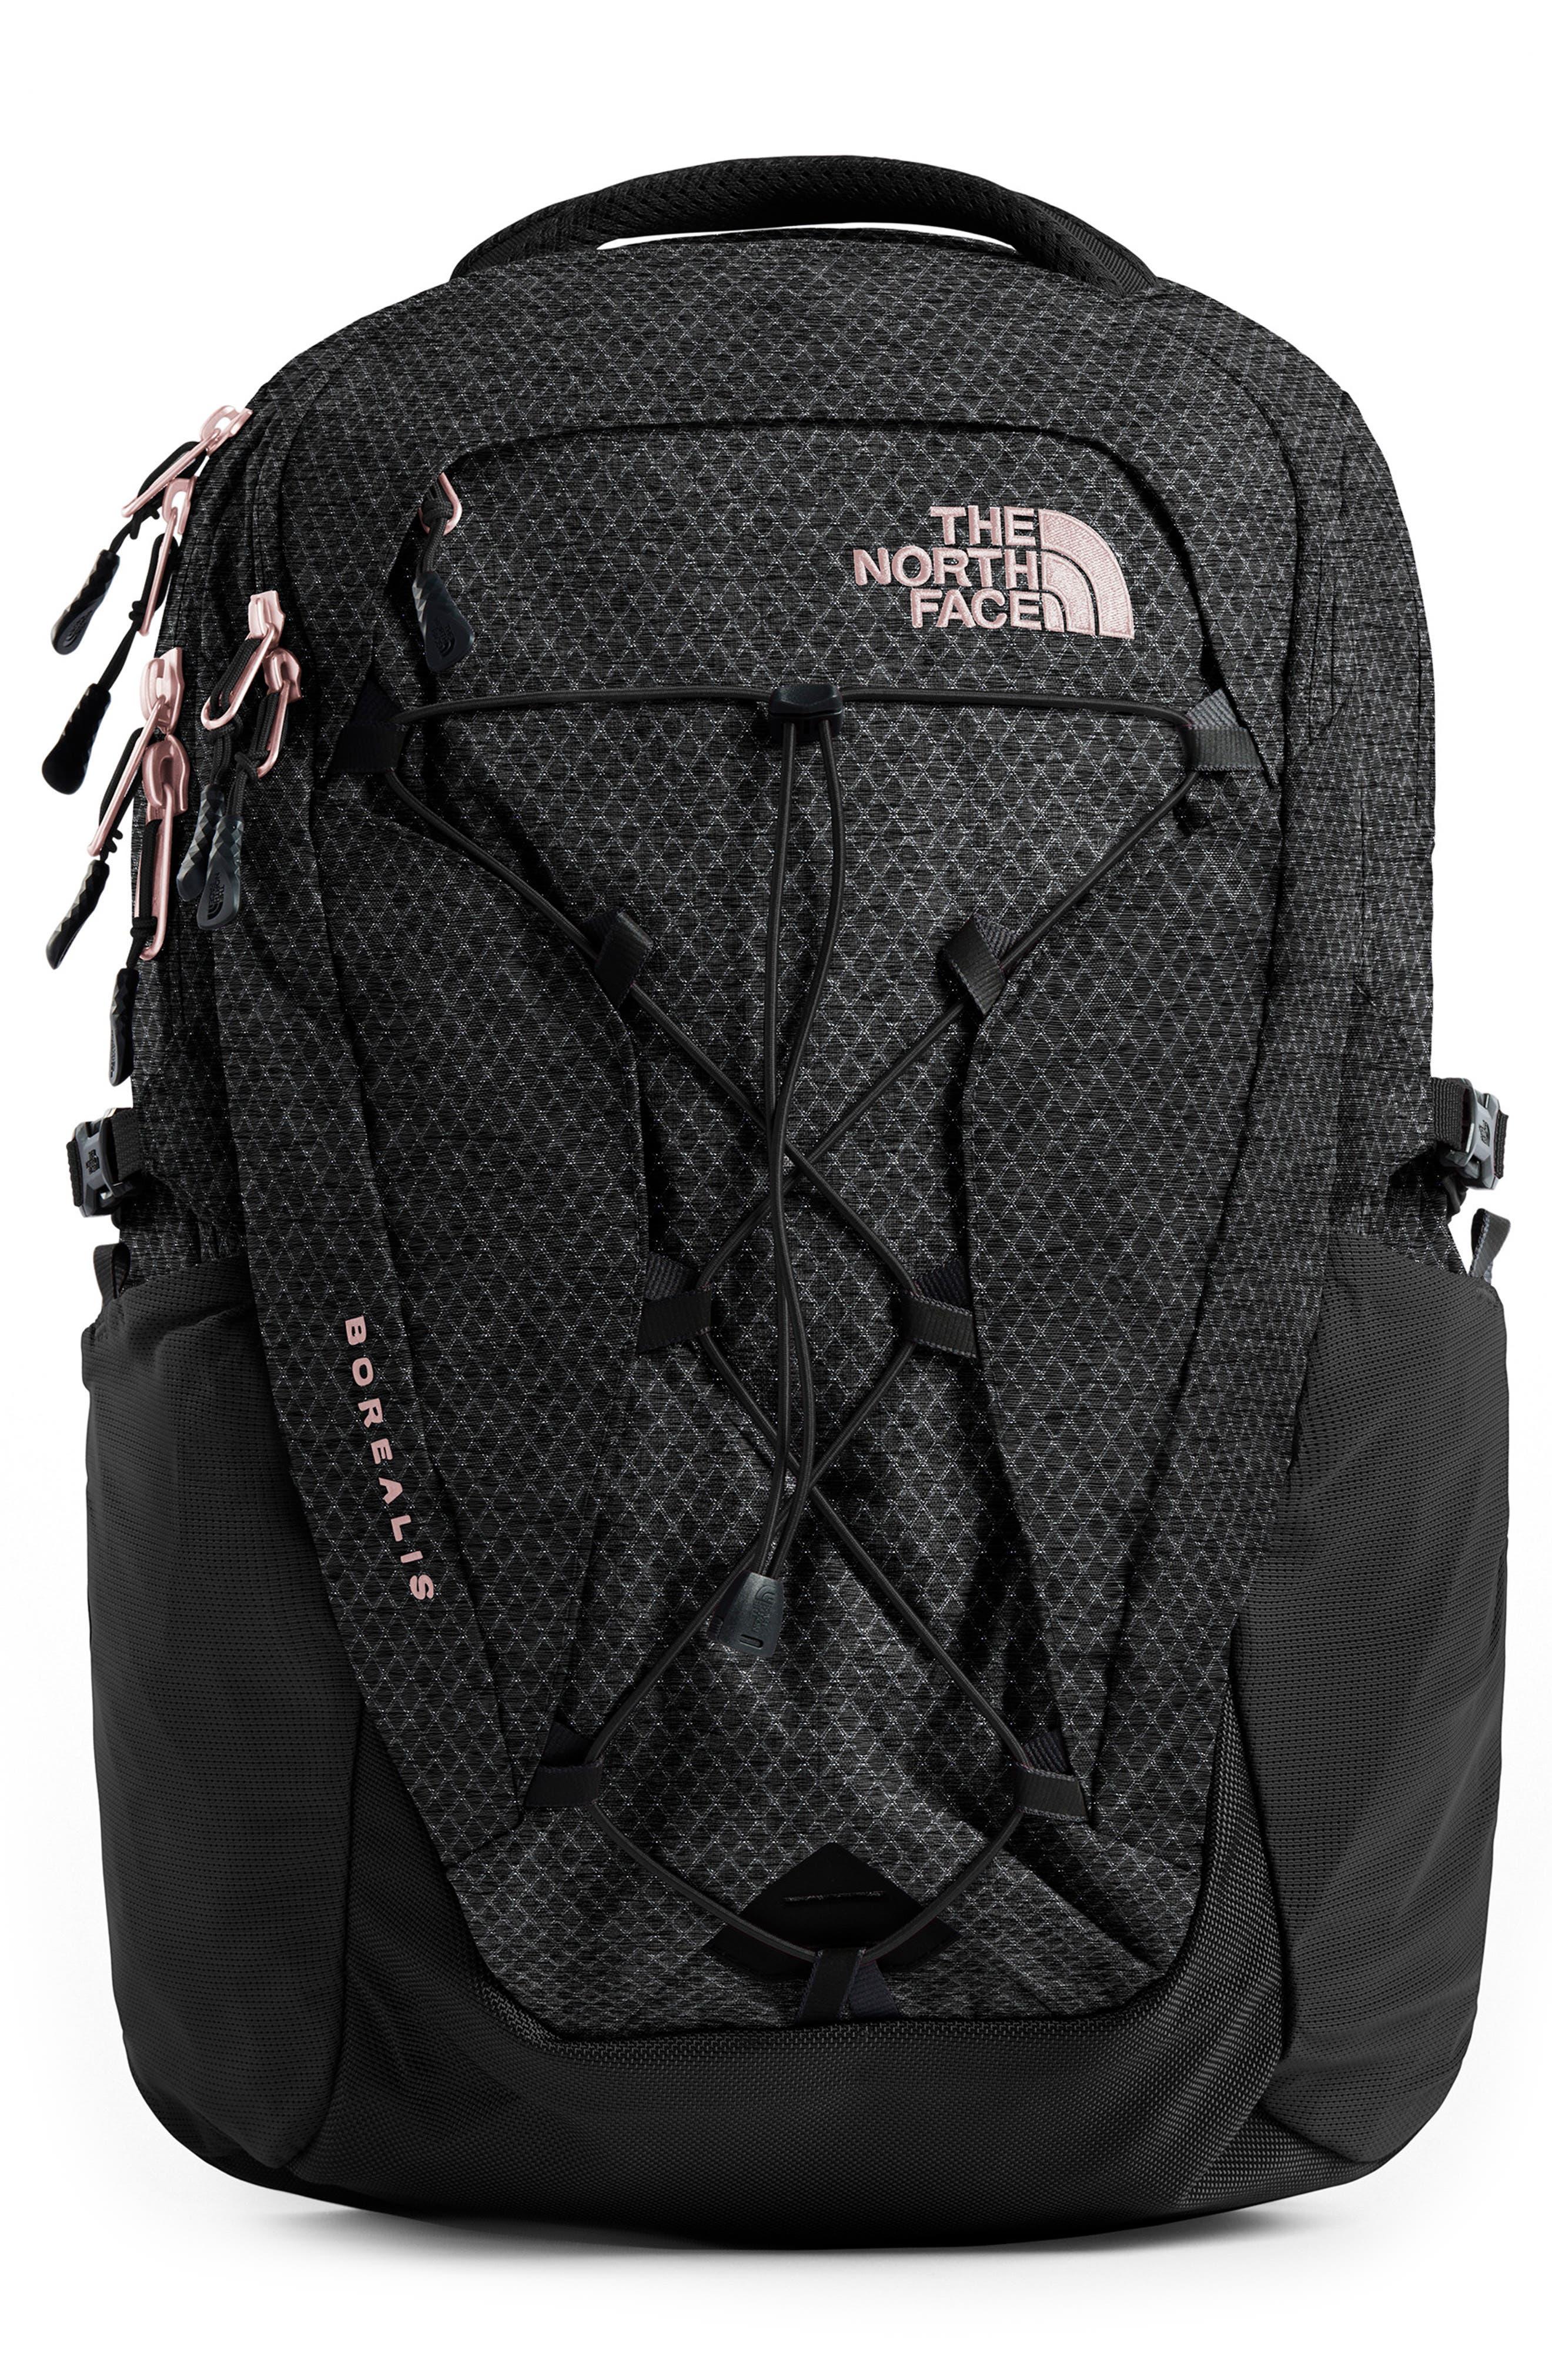 THE NORTH FACE, Borealis Backpack, Main thumbnail 1, color, TNF BLACK/ BURNT CORAL